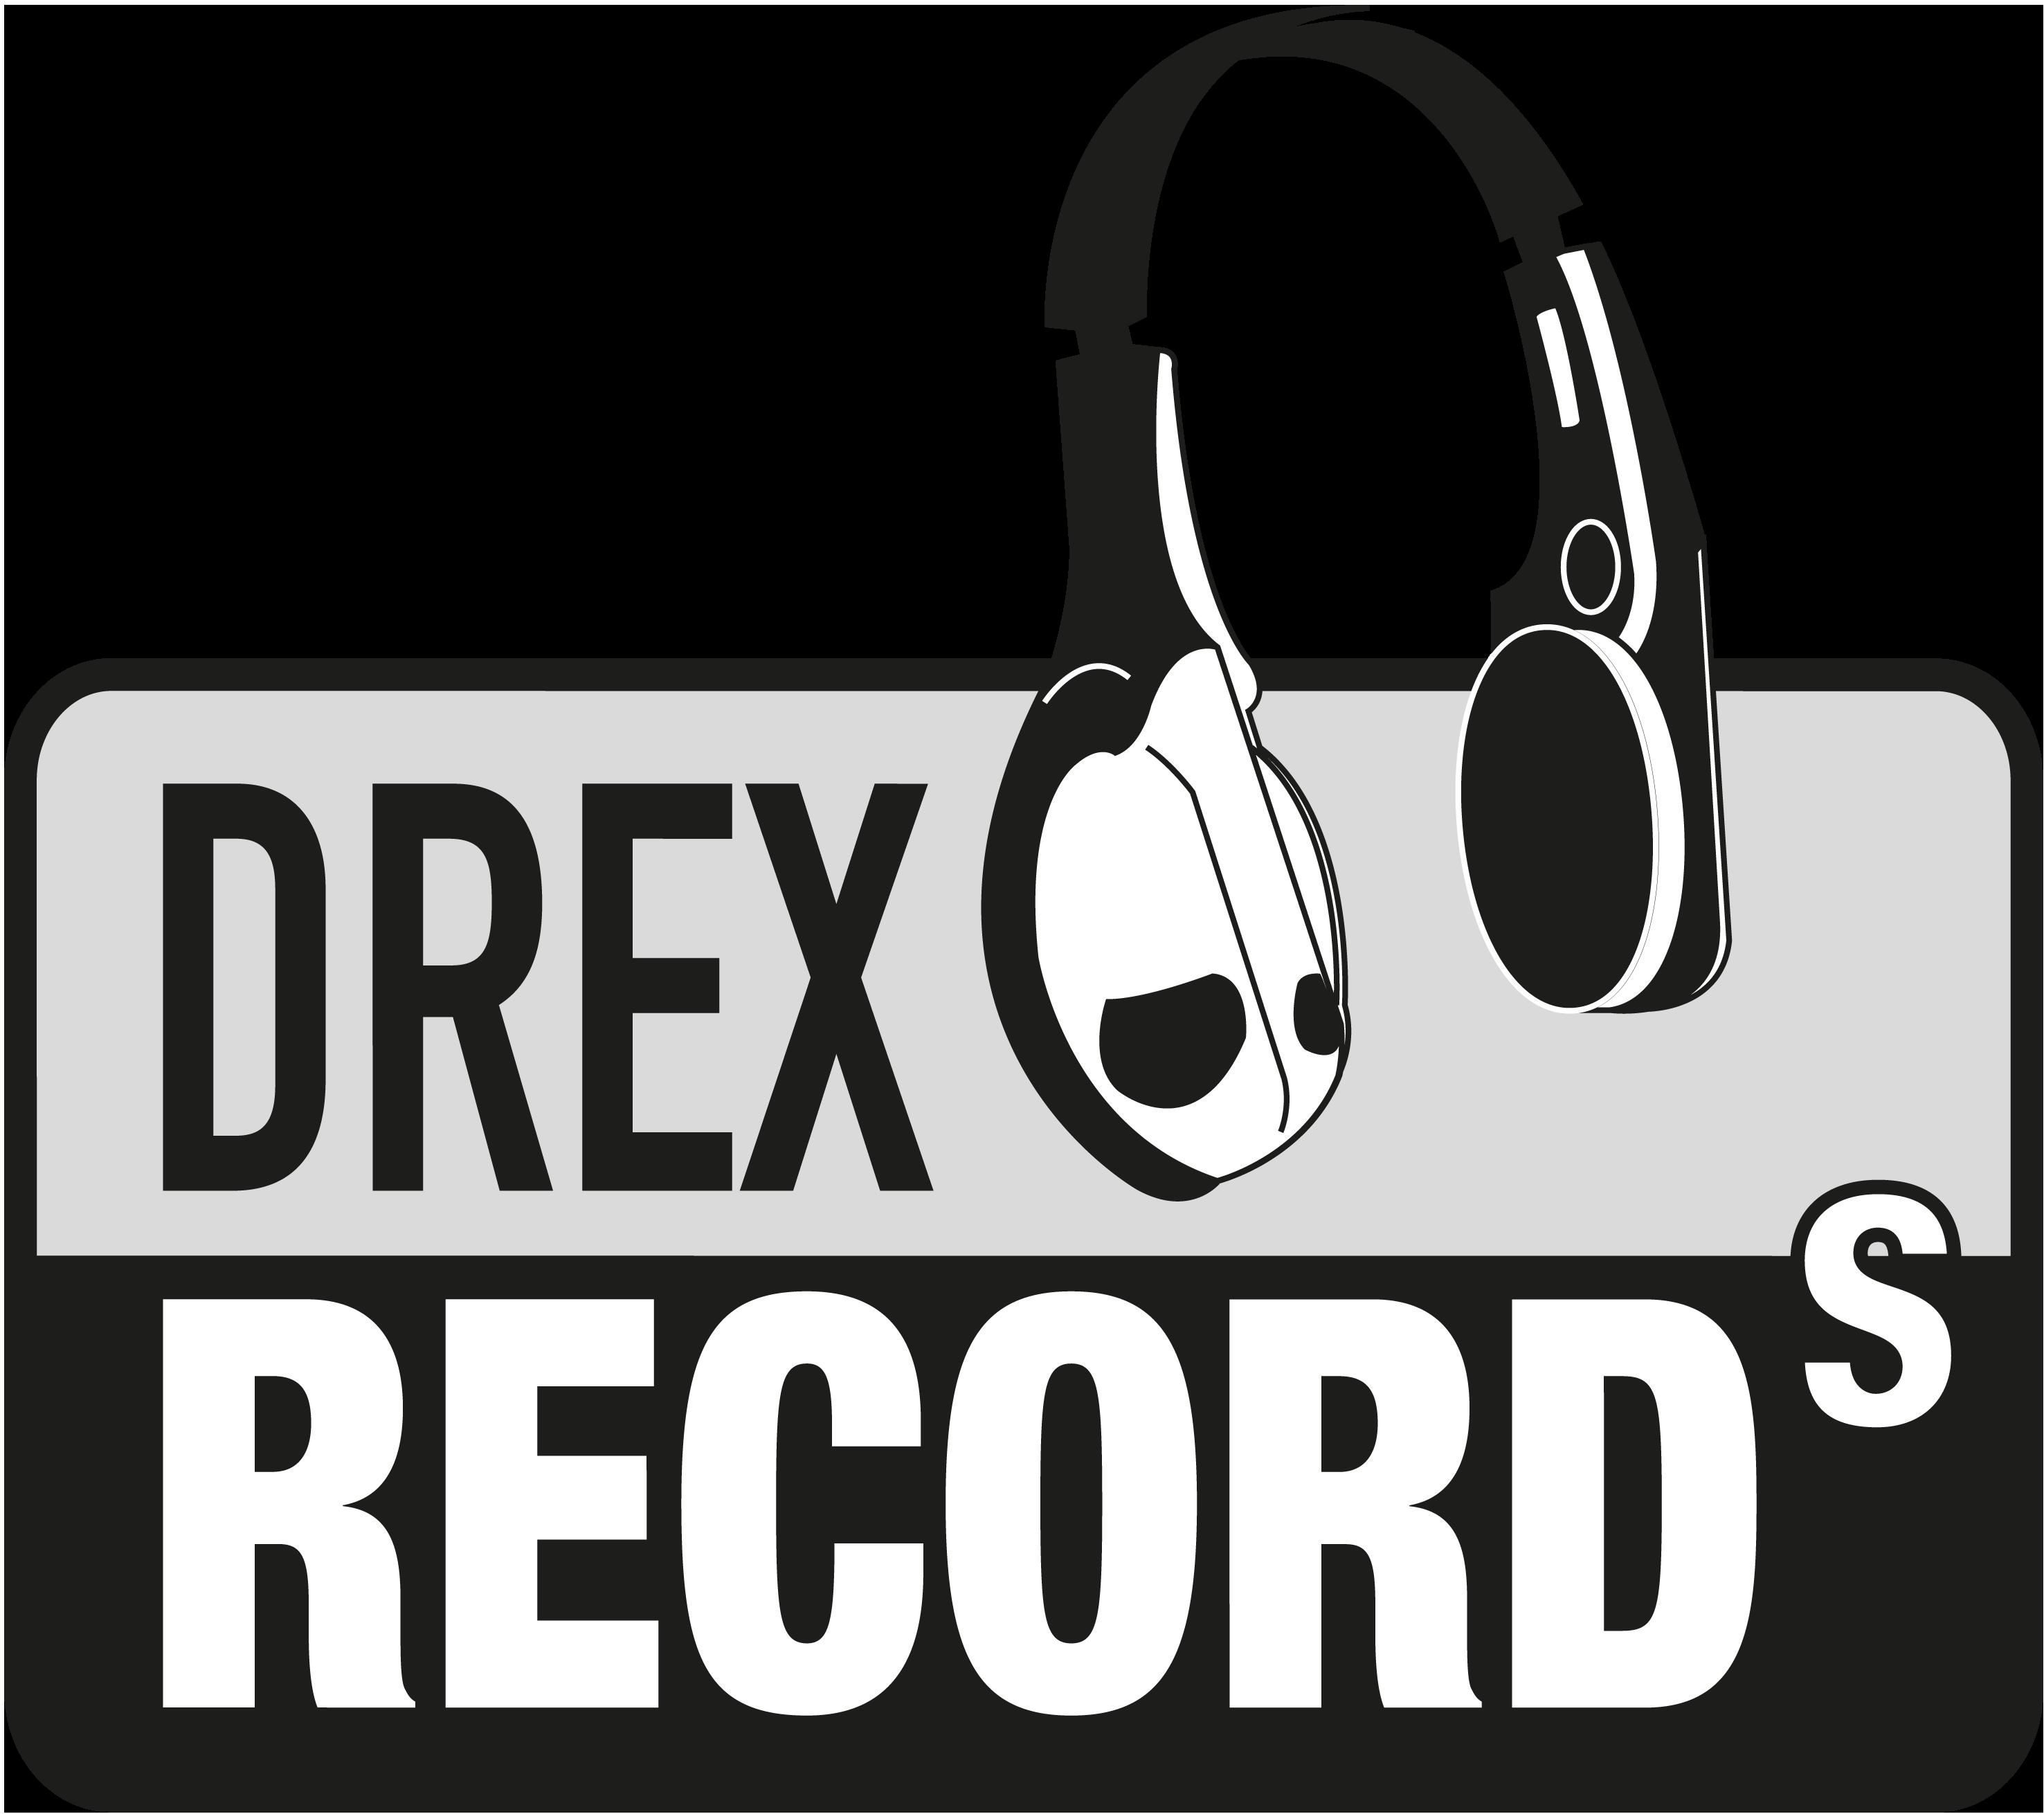 DREX-RECORDs